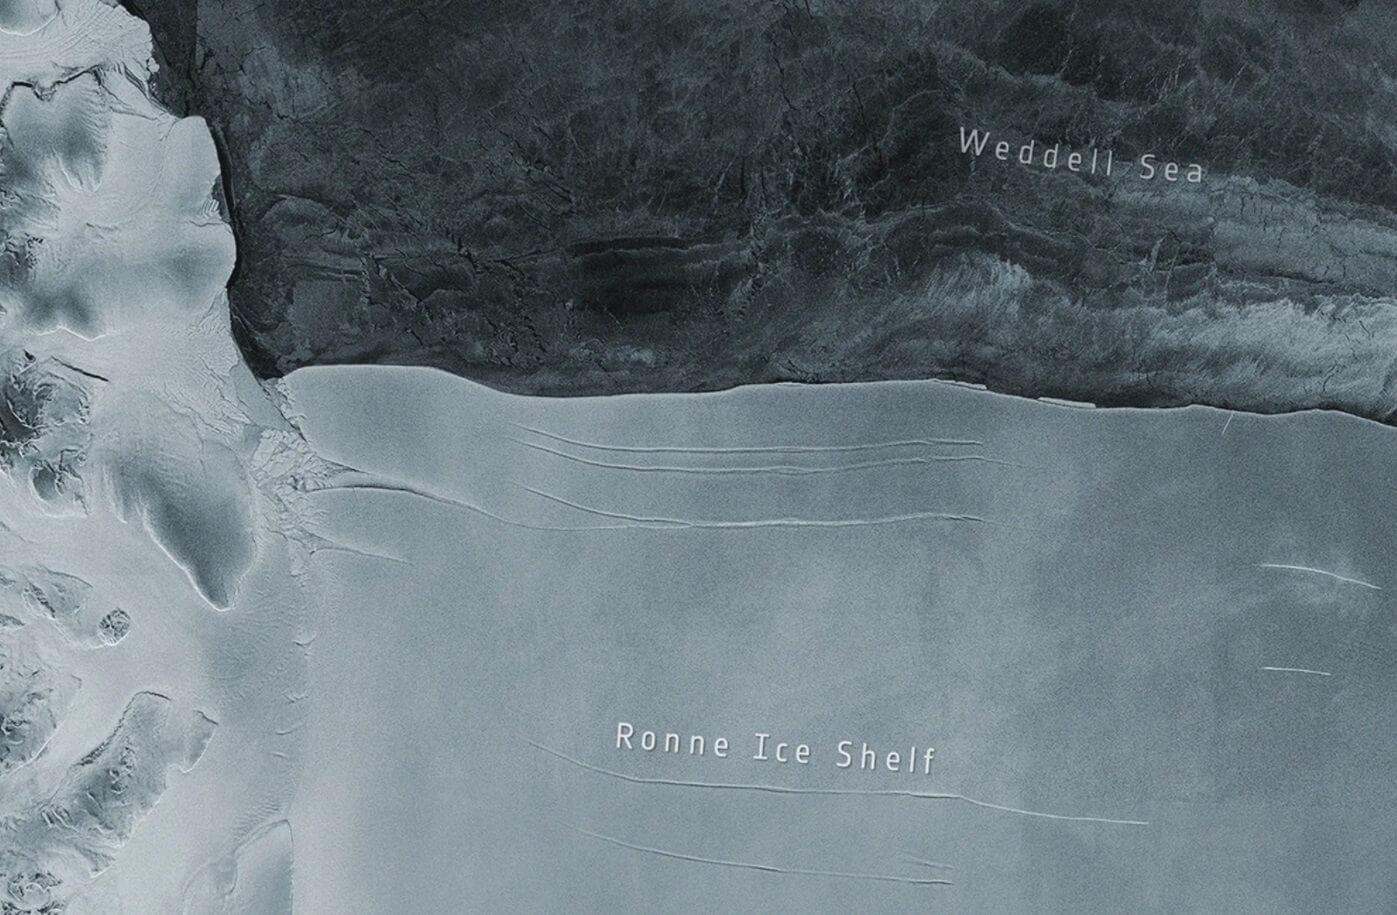 antarctic-largest-iceberg-a76-calving-start-may-2021